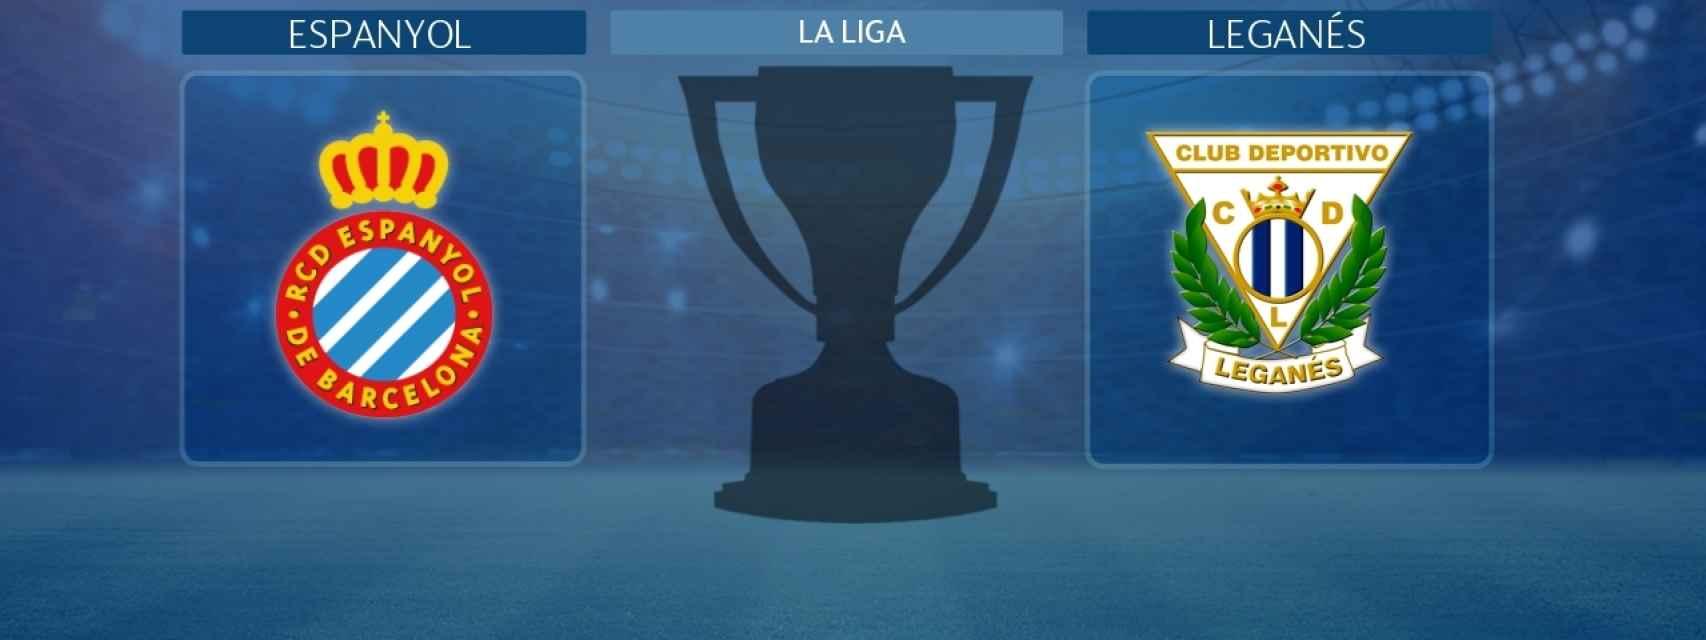 Espanyol - Leganés, partido de La Liga